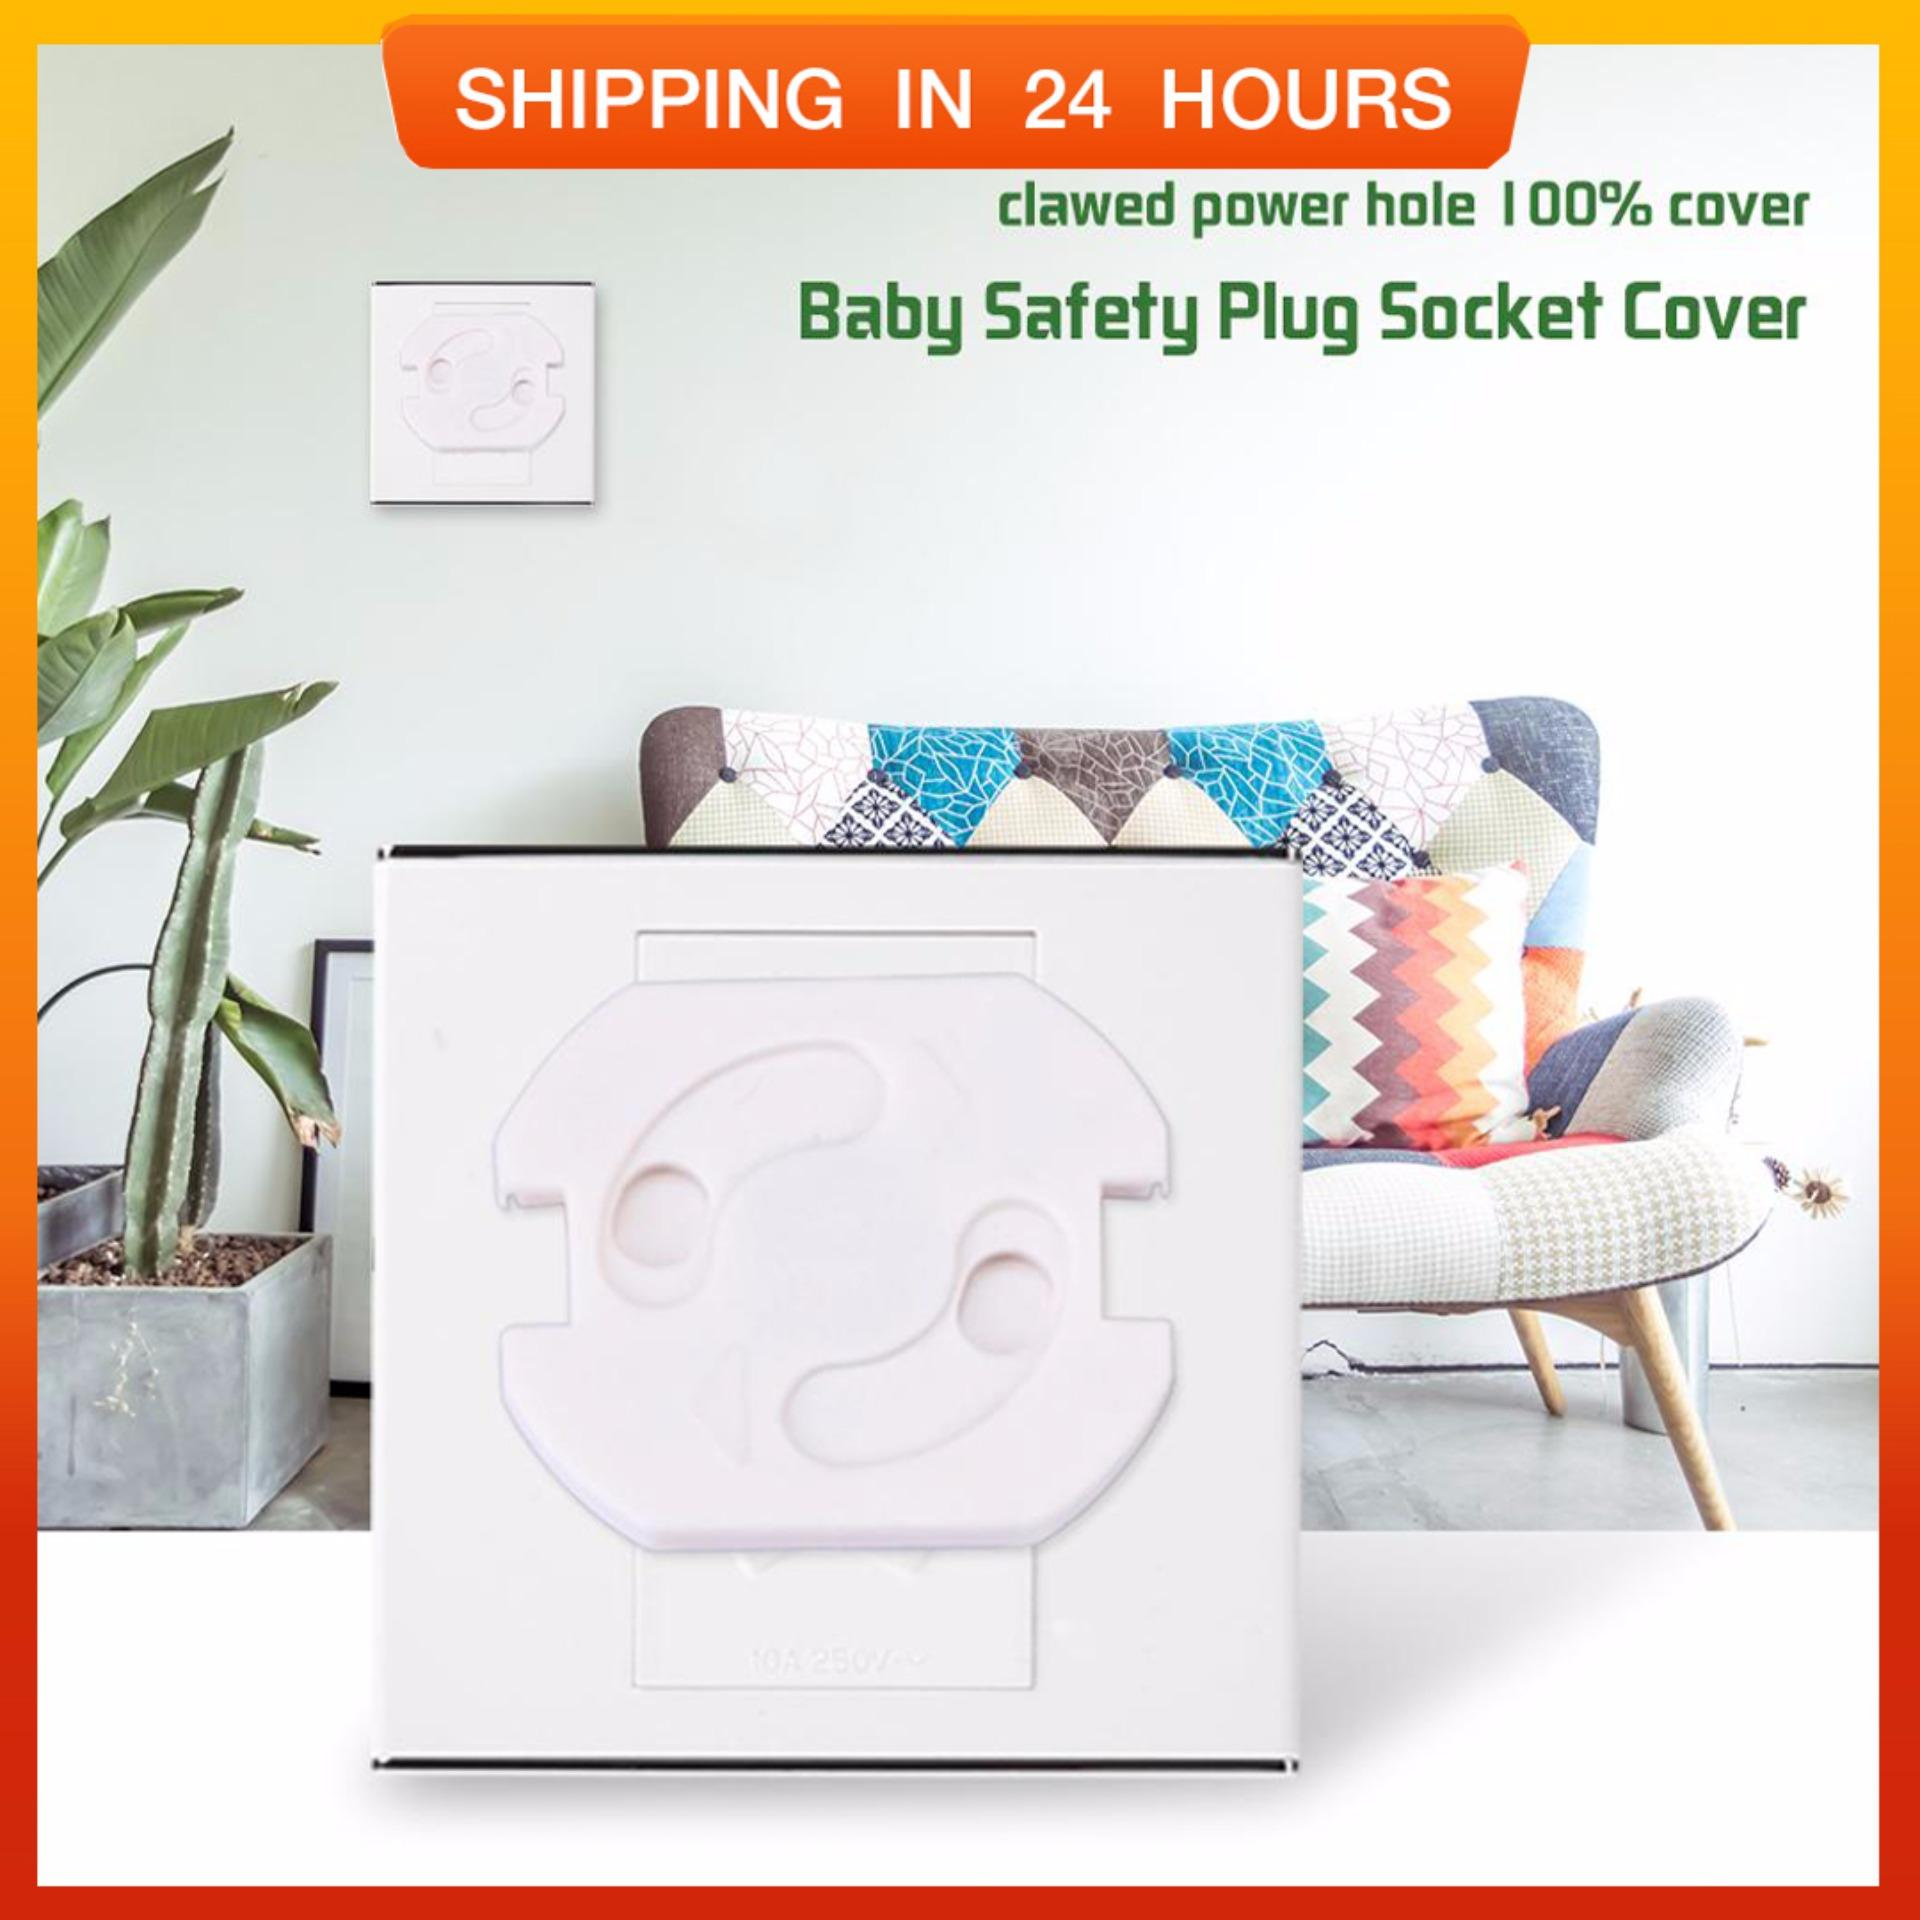 10 Pcs Stopkontak Listrik Eu Steker Diputar Soket Sarung Anti Elektrik Guncangan Bayi Keamanan Menjaga-Internasional By Globedealwin.